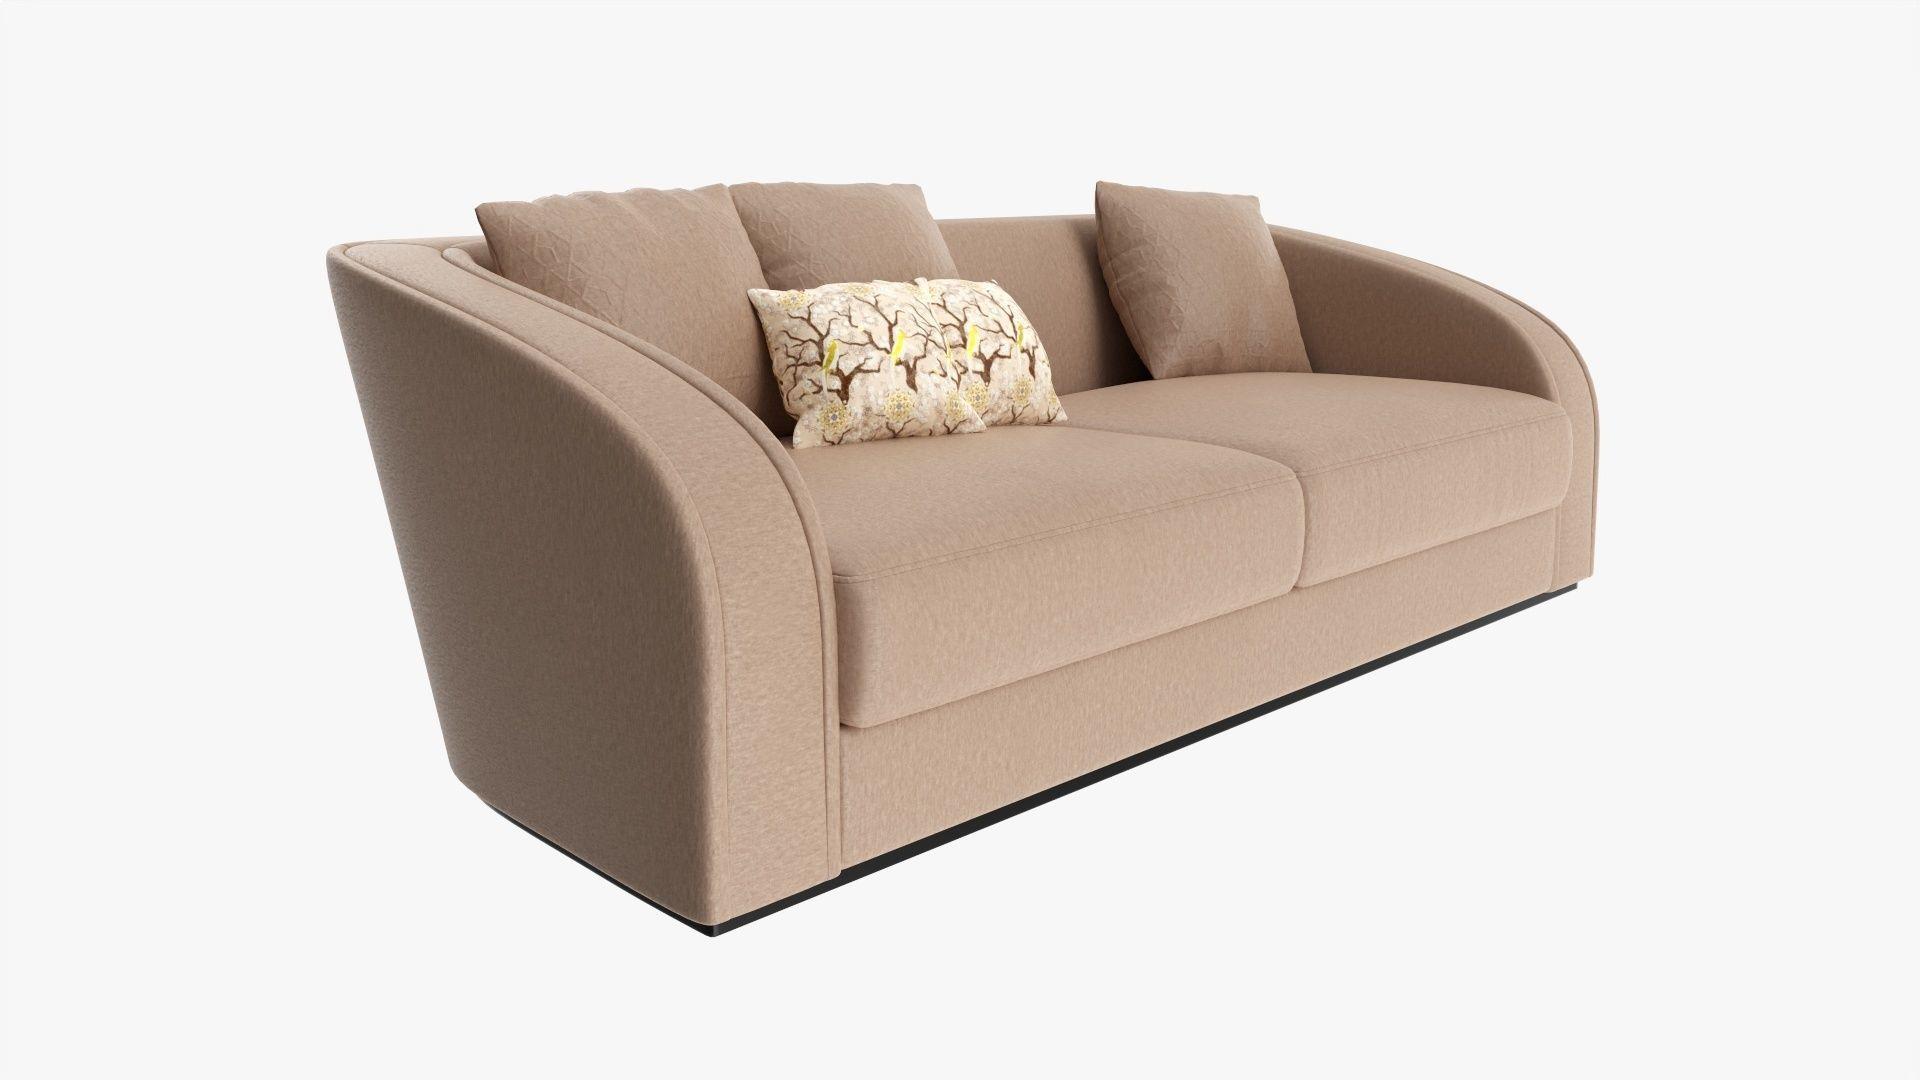 Loveseat sofa 02